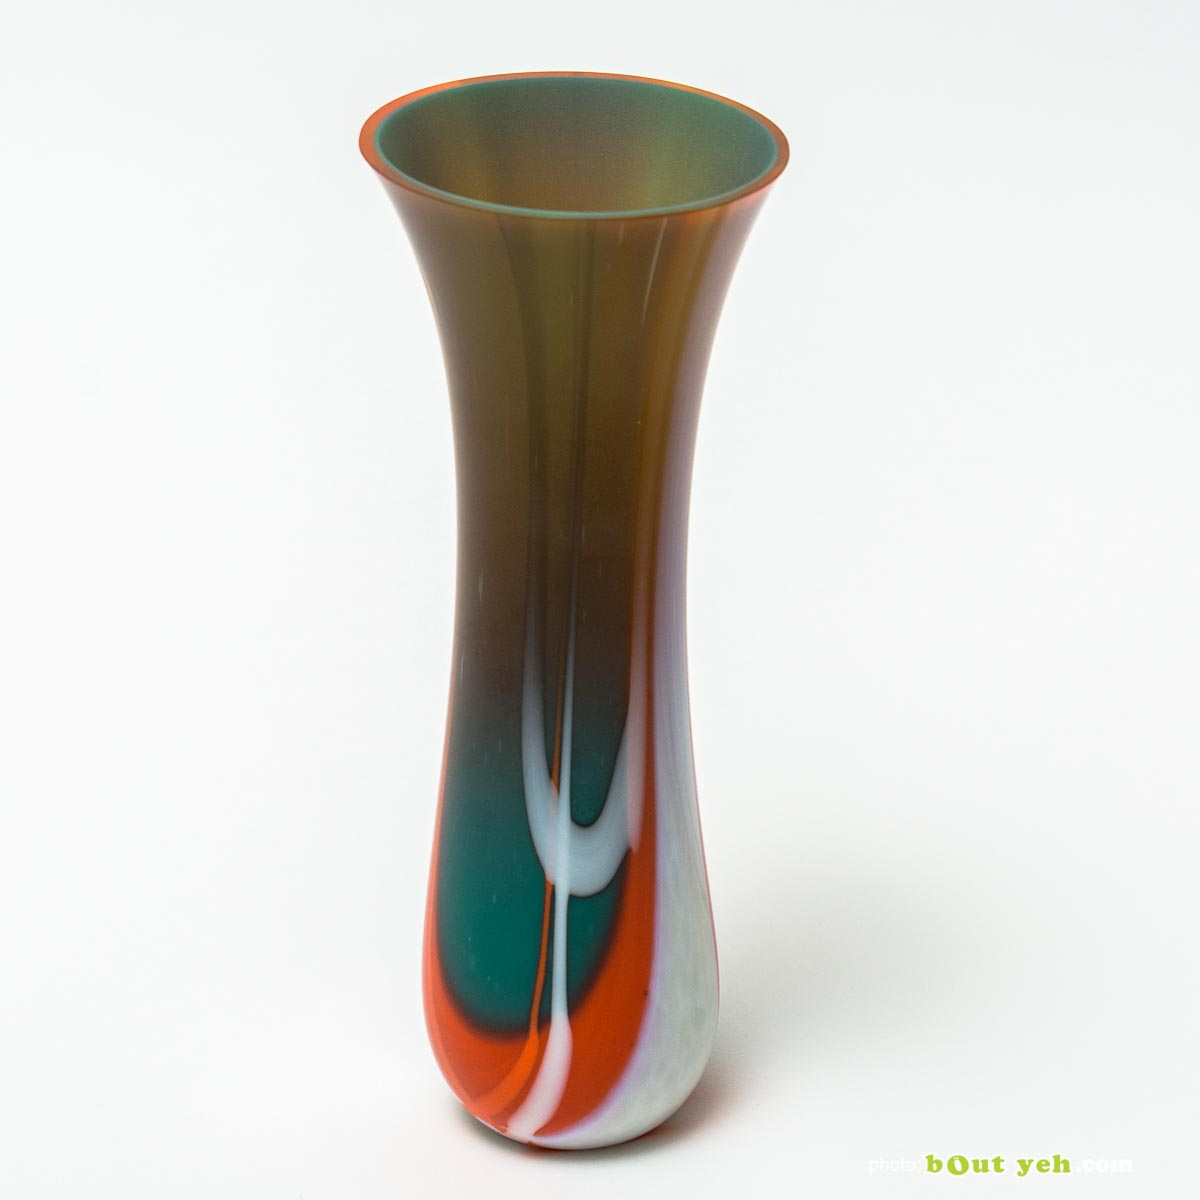 Contemporary orange bullseye tulip vase with green interior, hand made by Keith Sheppard Irish glassware - photo 1677